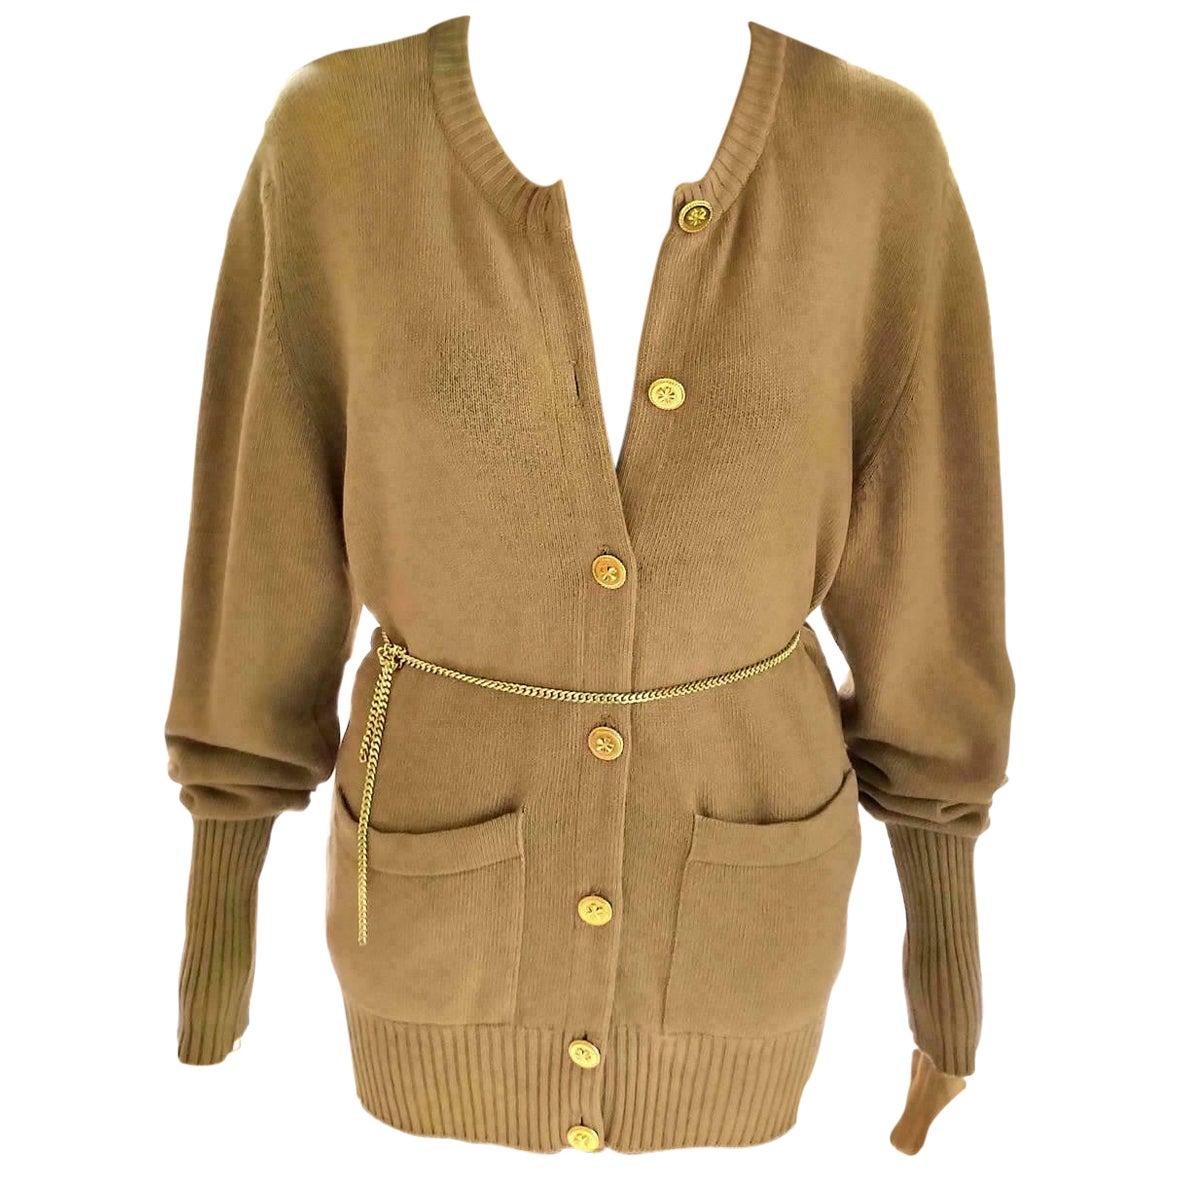 Vintage Chanel Camel Tan & Gold 100% Cashmere Sweater Cardigan FR 38/ US 4 6